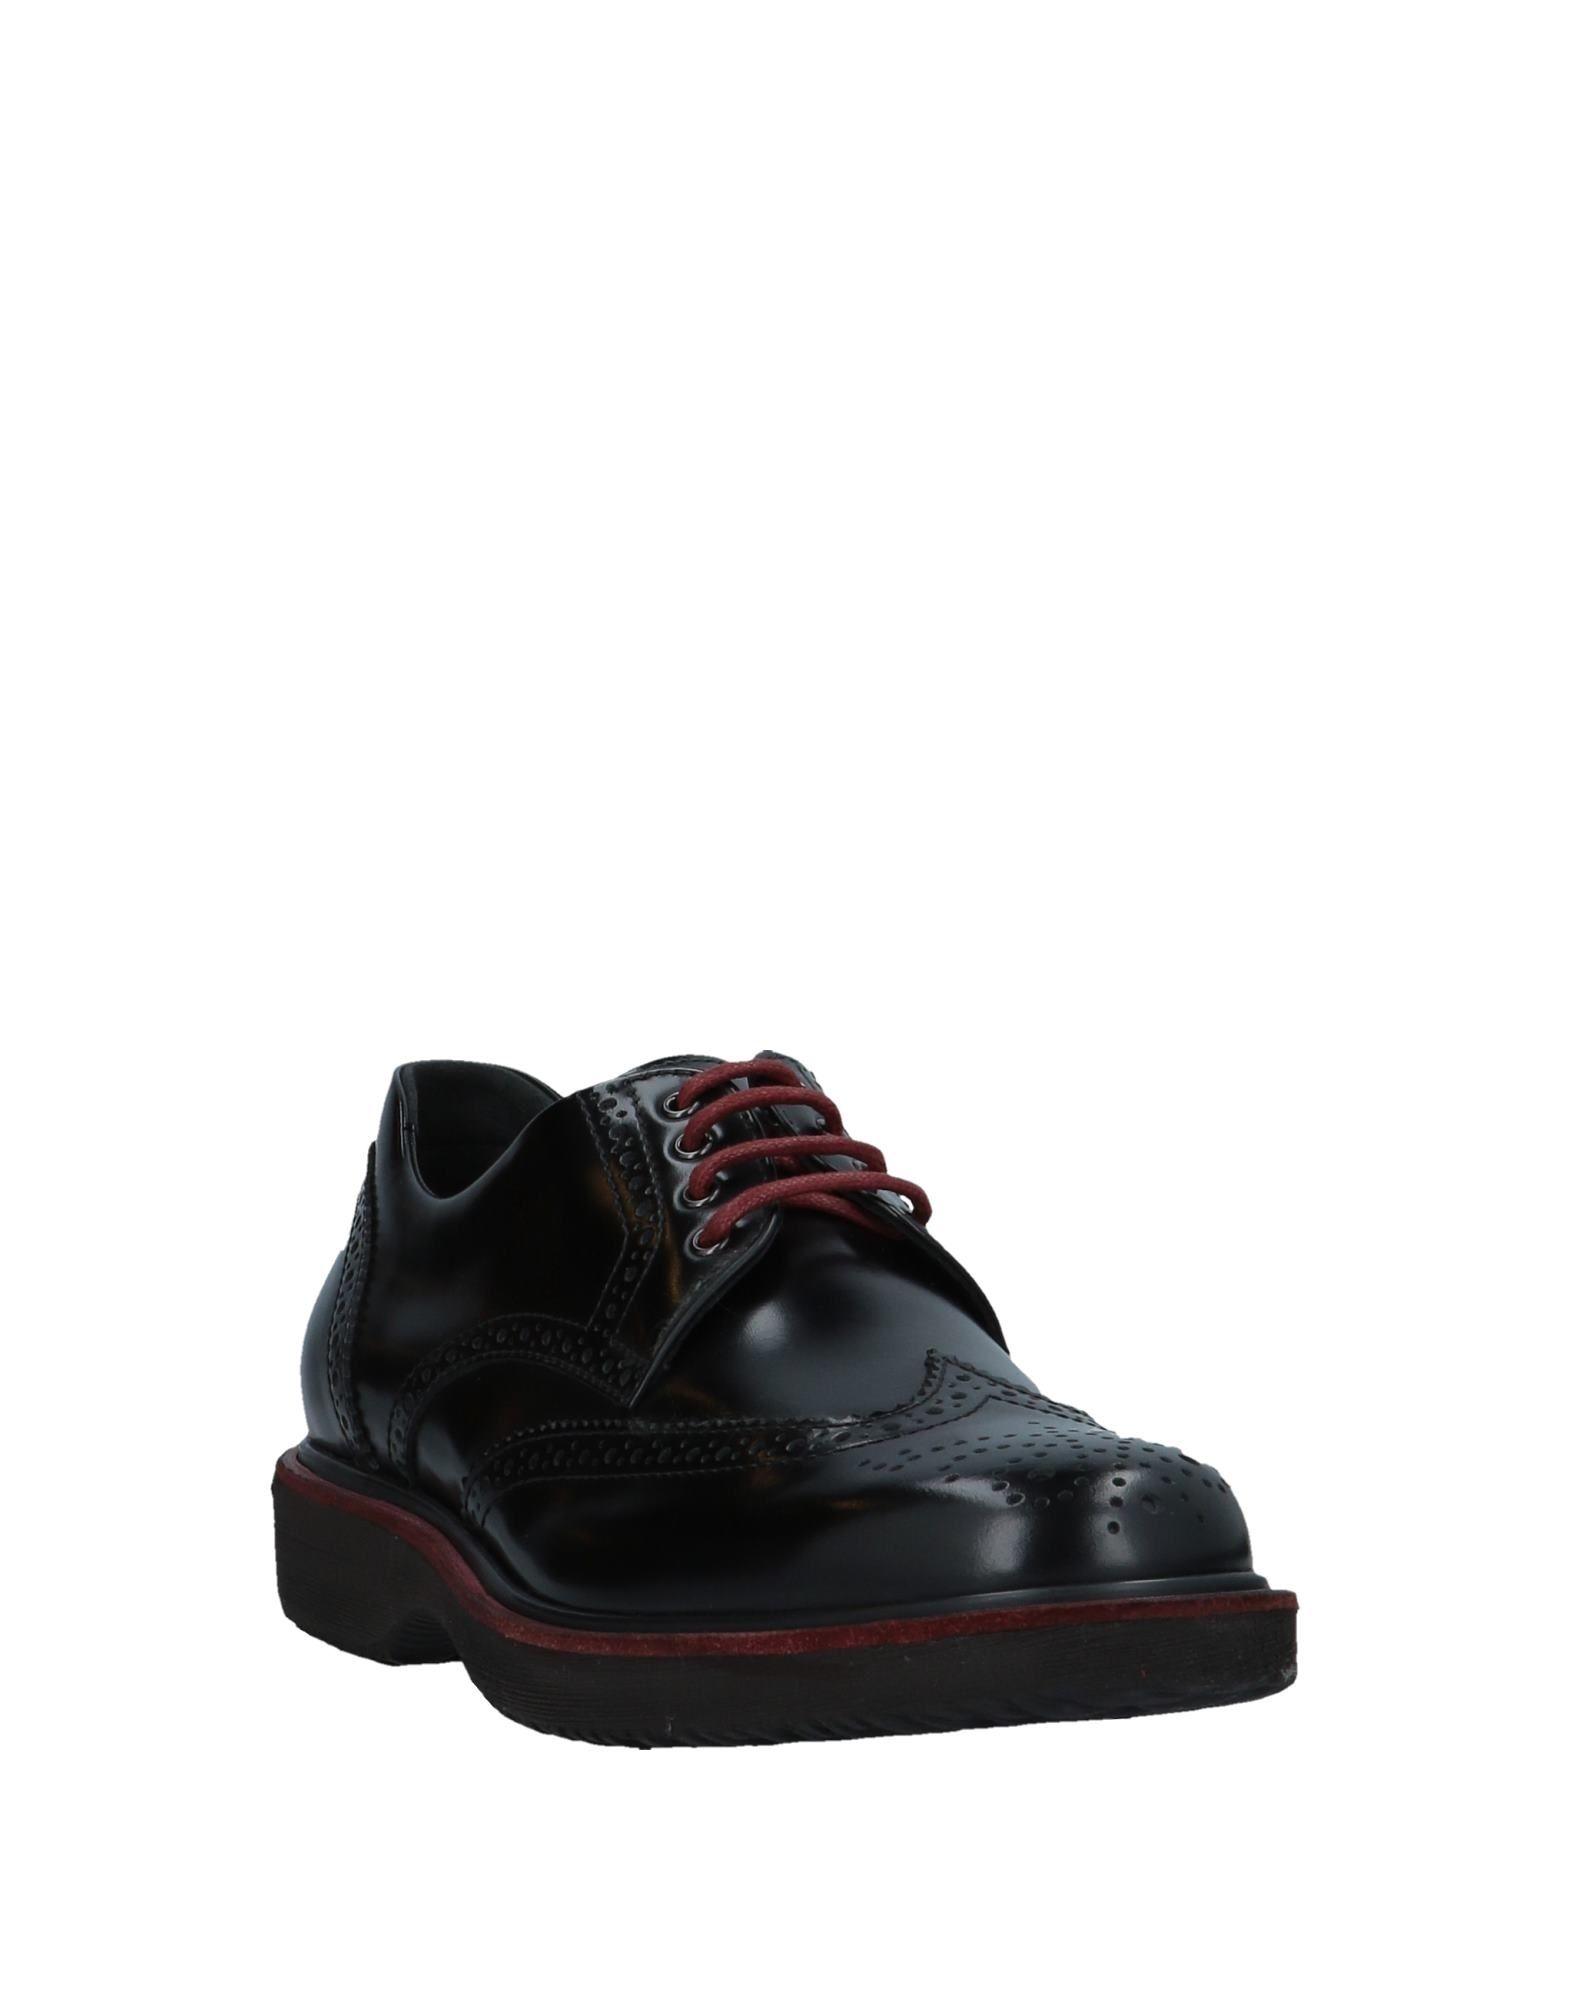 hogan plein de chaussures - hommes hogan mélangé de chaussures au en ligne au chaussures royaume - uni - 11541413po f52645